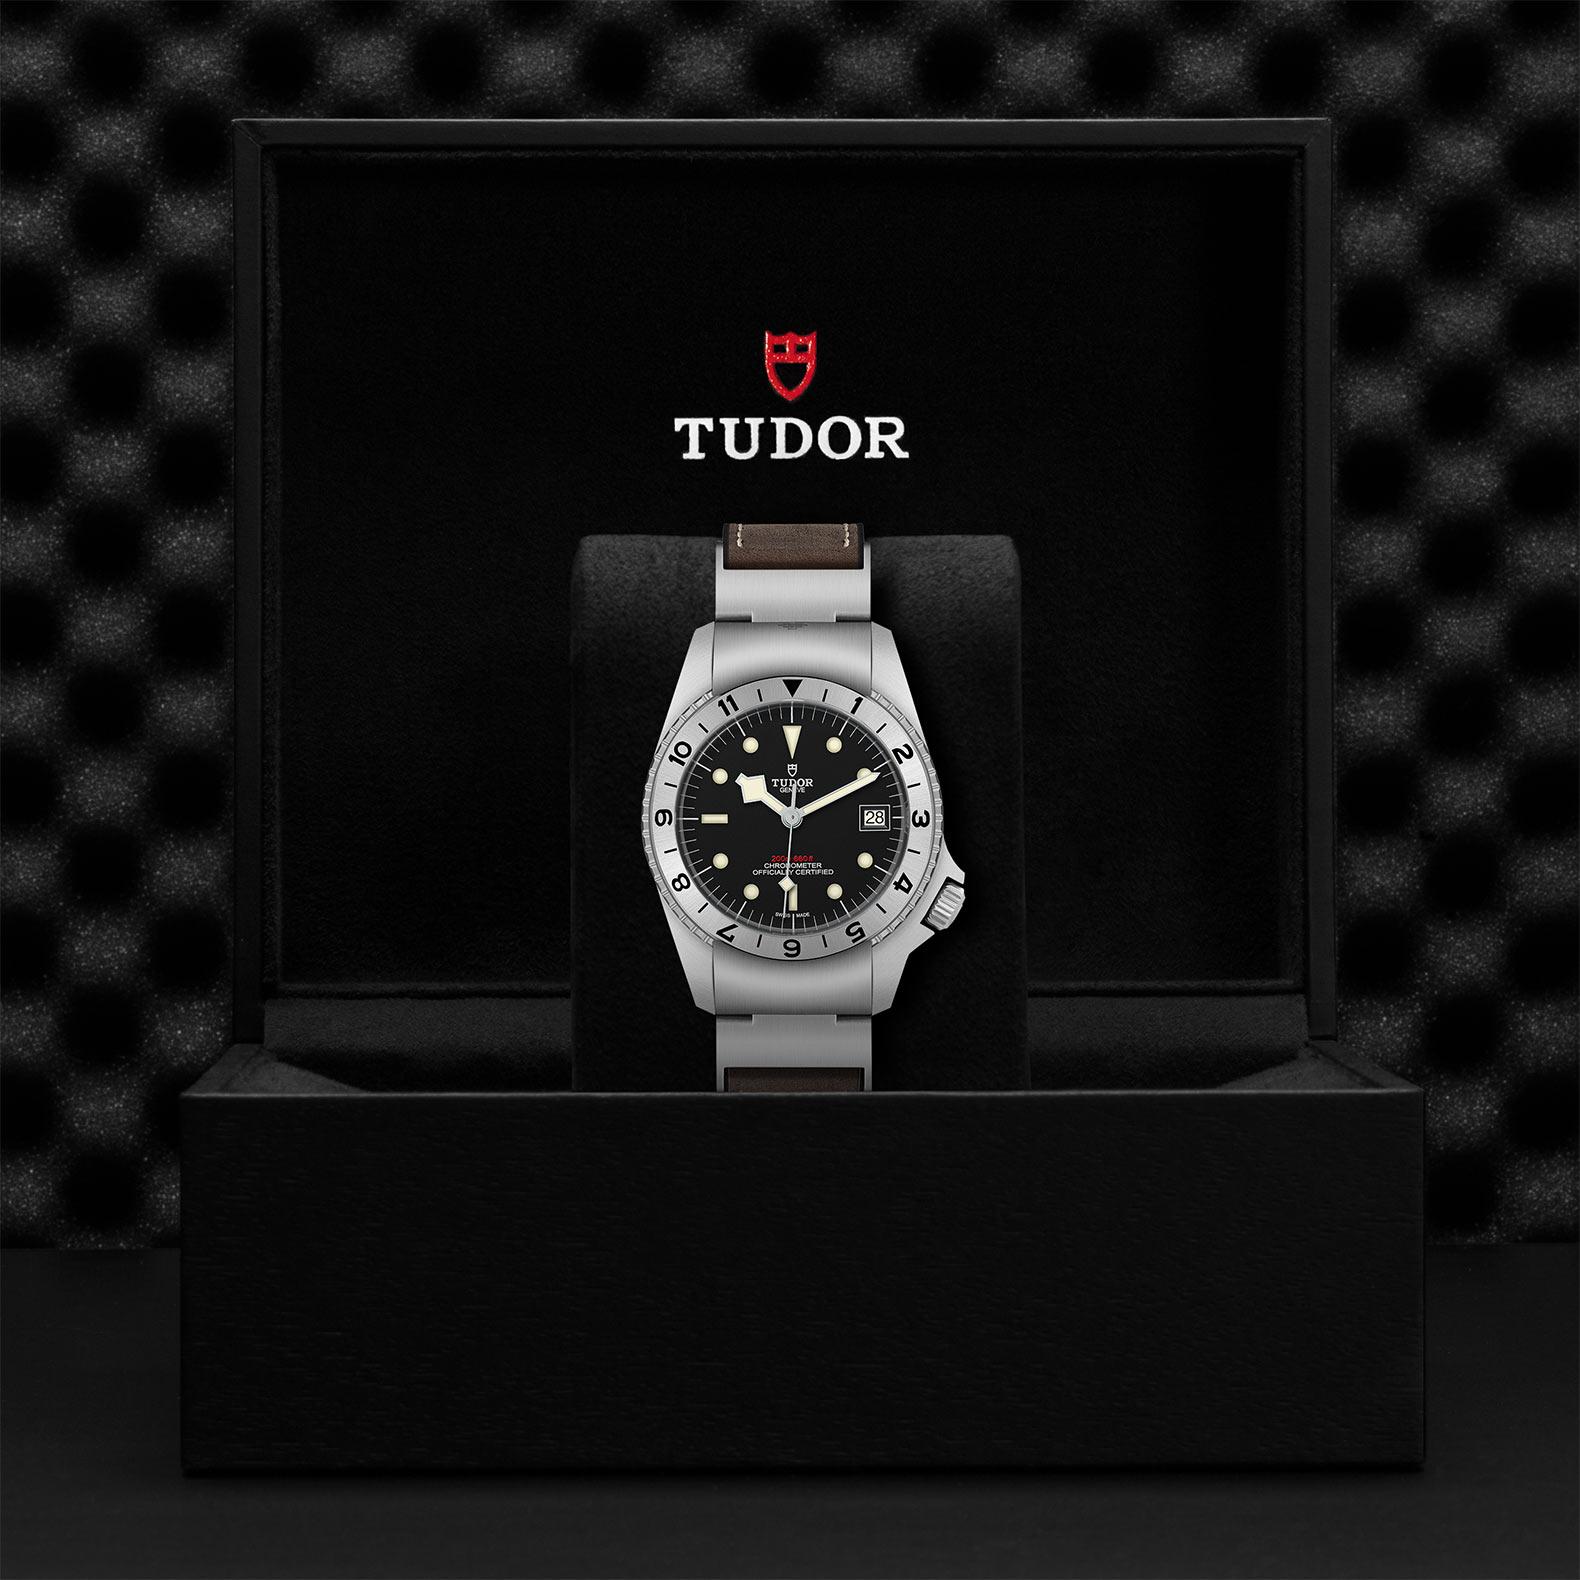 TUDOR Black Bay P01 - M70150-0001